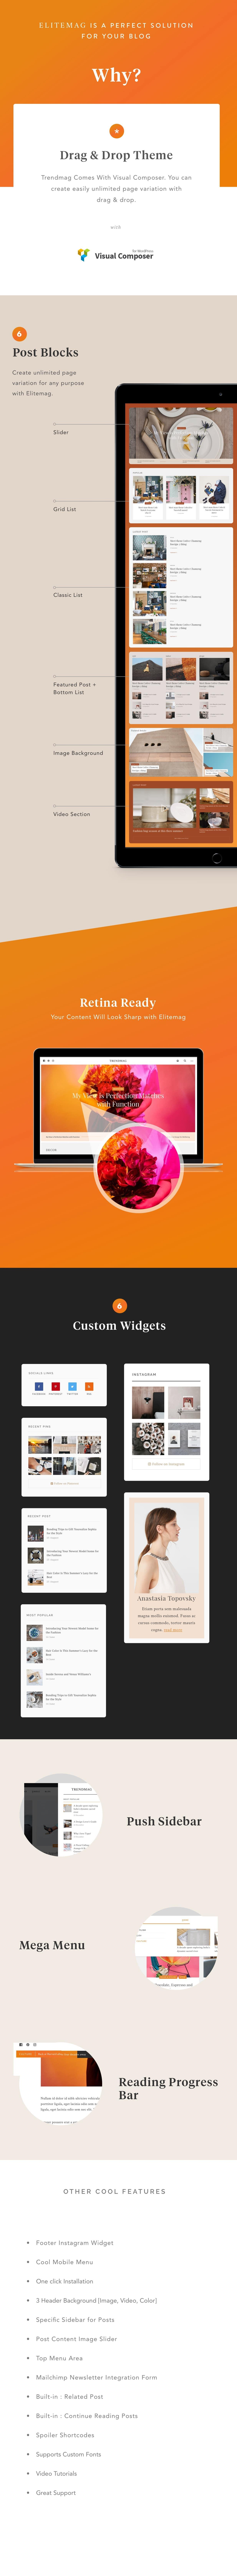 Elitemag - Stylish WordPress Blog and Magazine Theme - 5